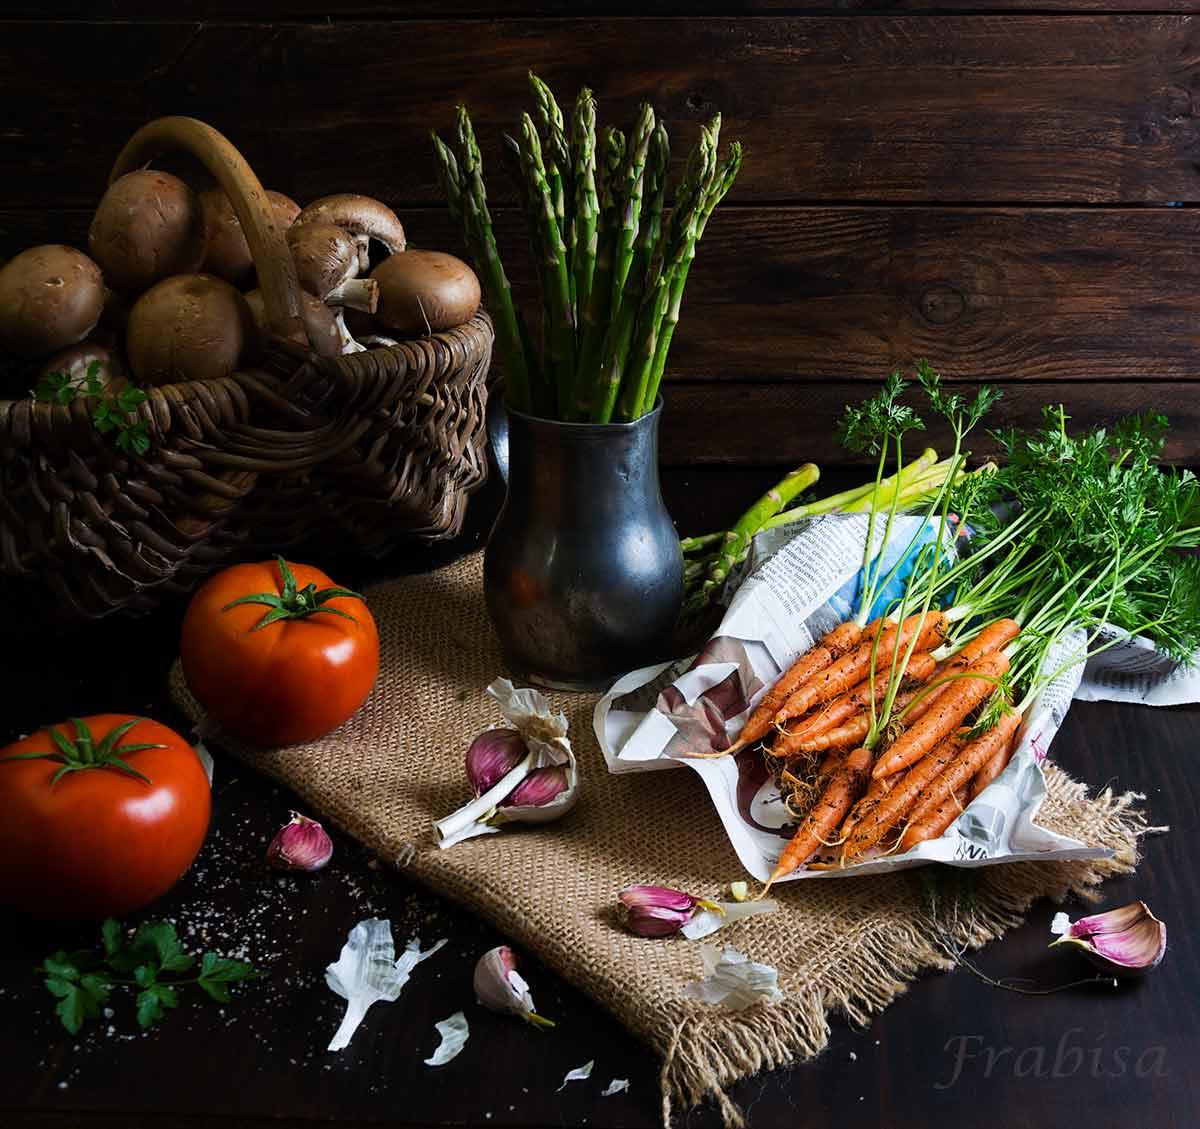 chuleton-vaca, buey, plancha, asado, receta, verduras, guarnicion